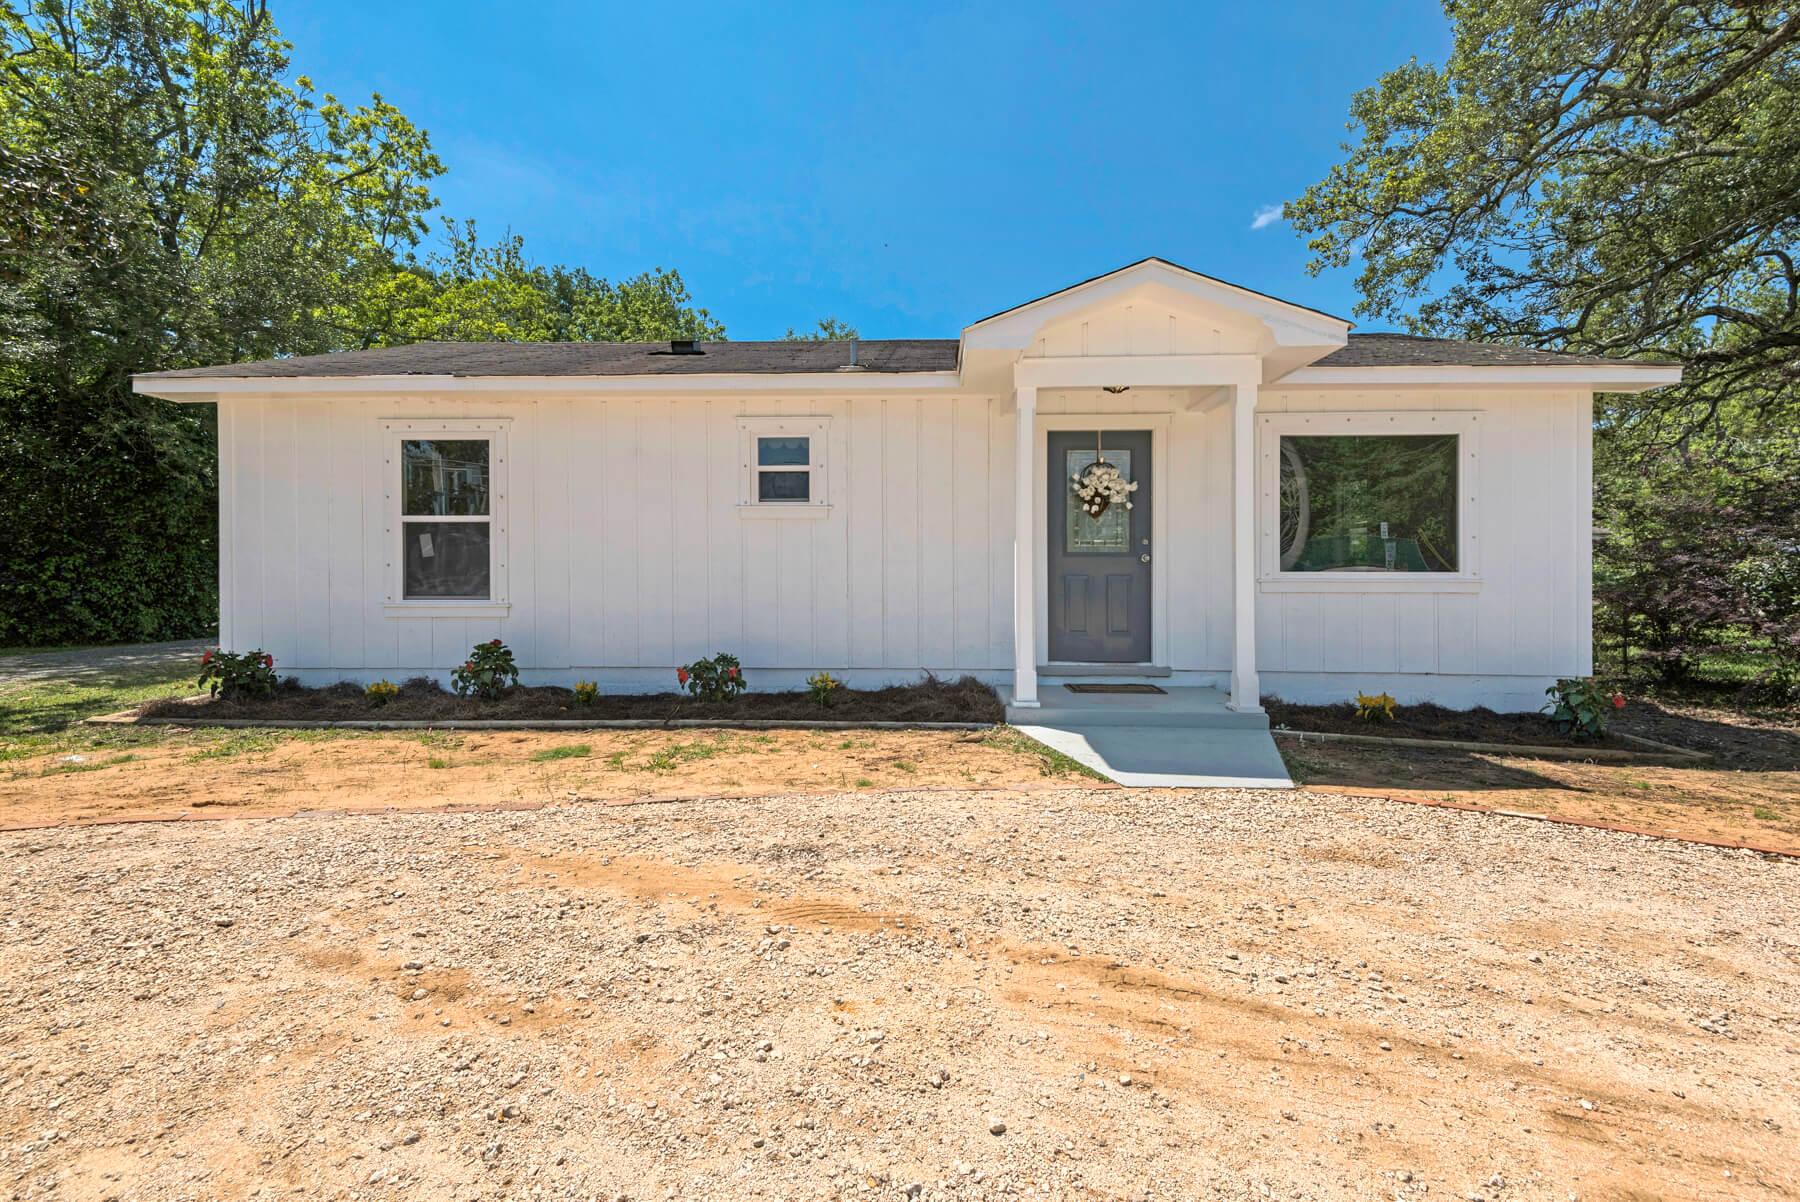 7466 Twin Beech Road Fairhope for Sale Urban Property Outside view 2